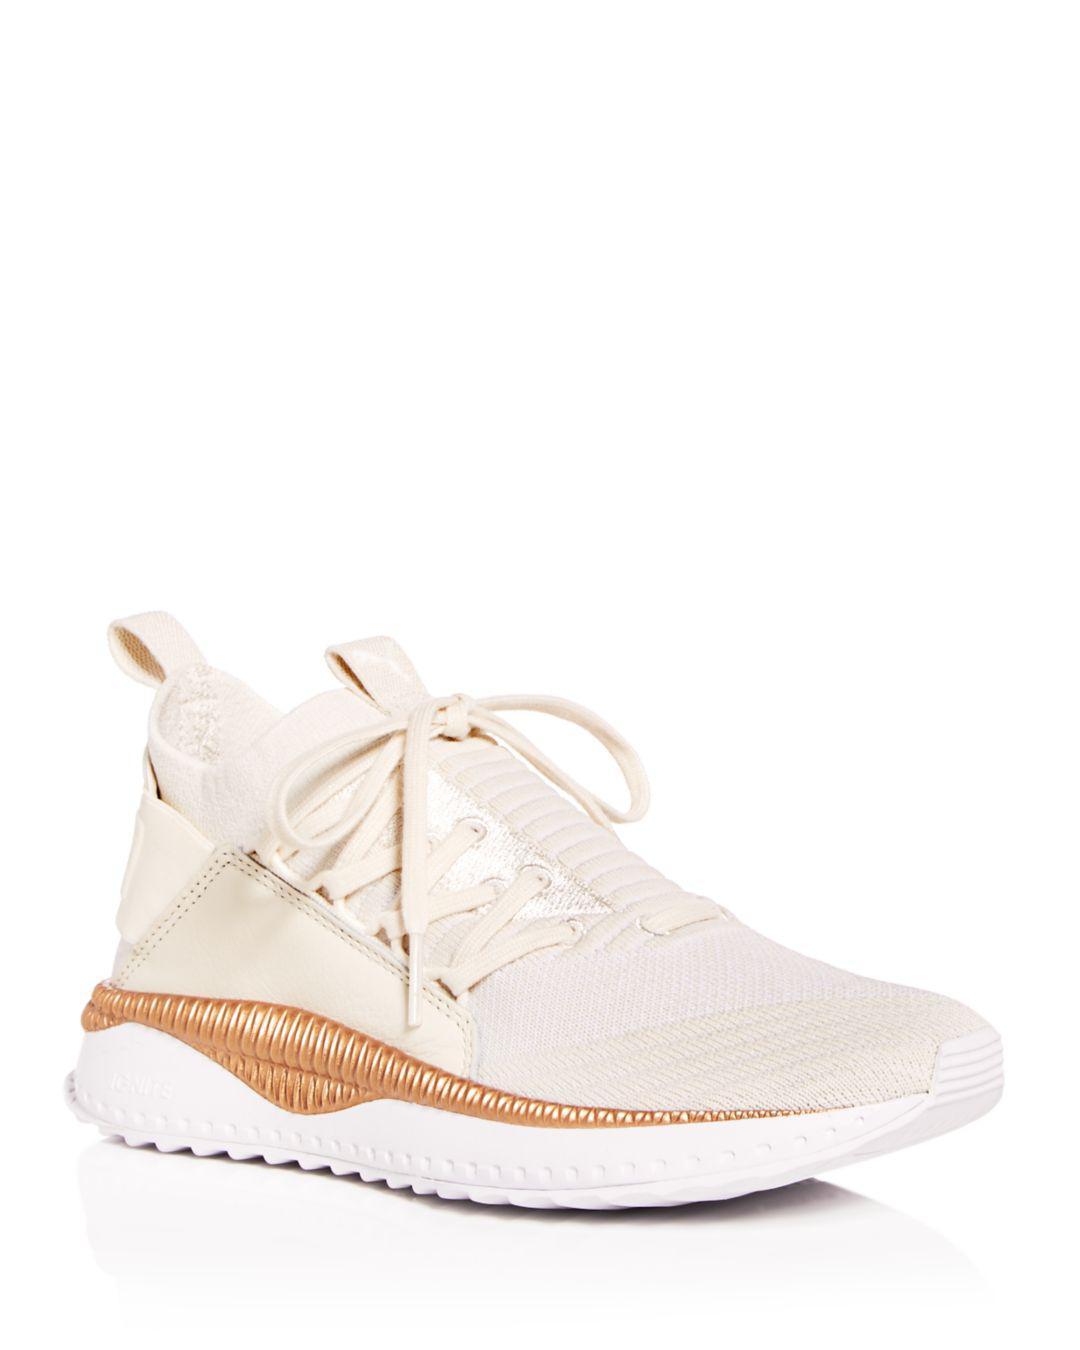 Lyst - PUMA Women s Tsugi Jun Knit Lace Up Sneakers in White 14ee10310